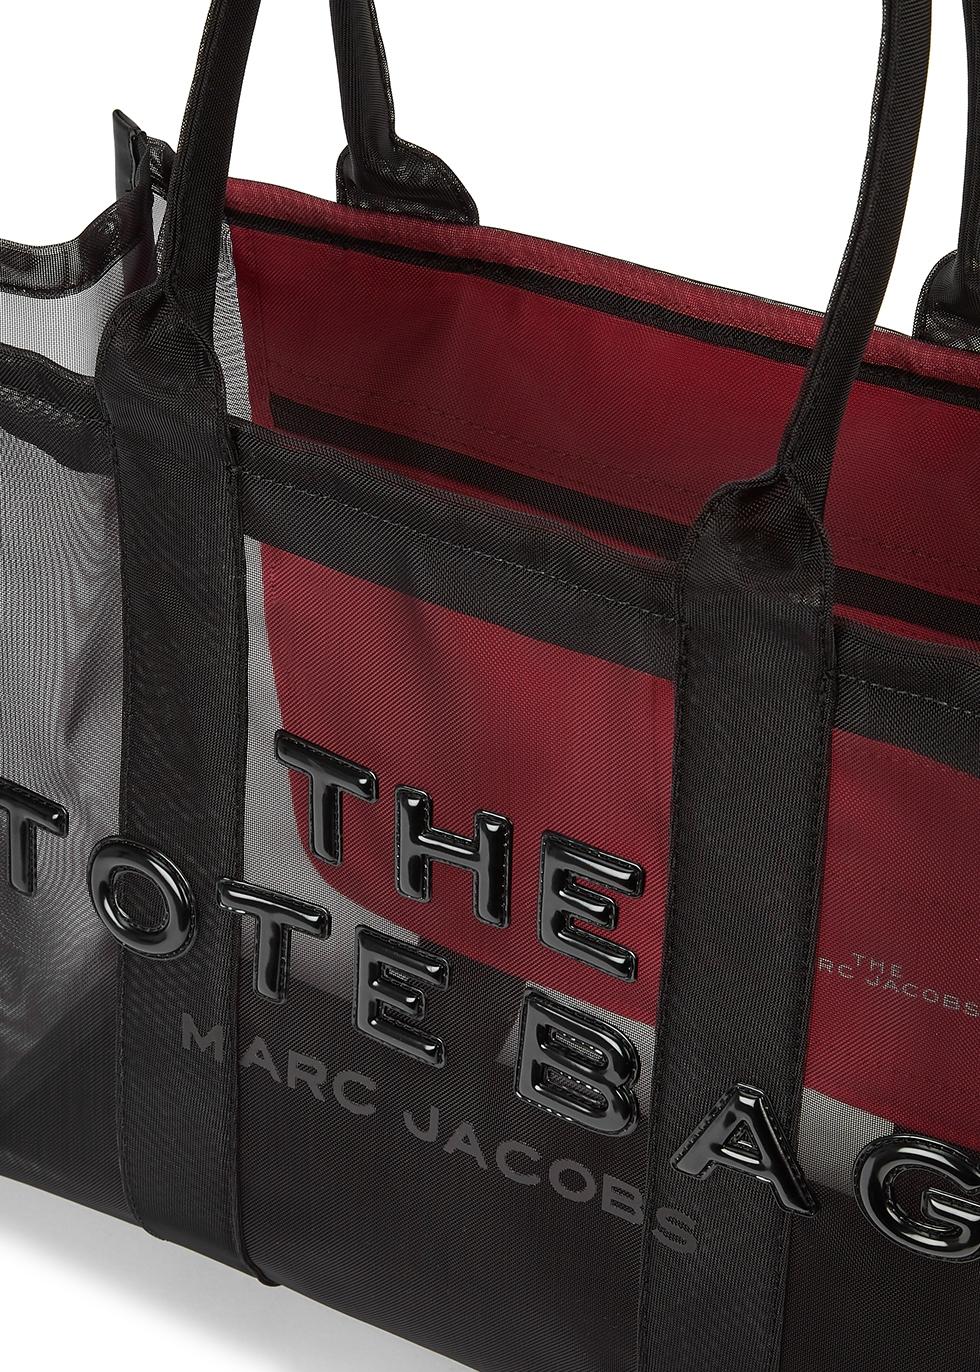 Marc Jacobs (The) The Traveler black mesh tote - Harvey Nichols